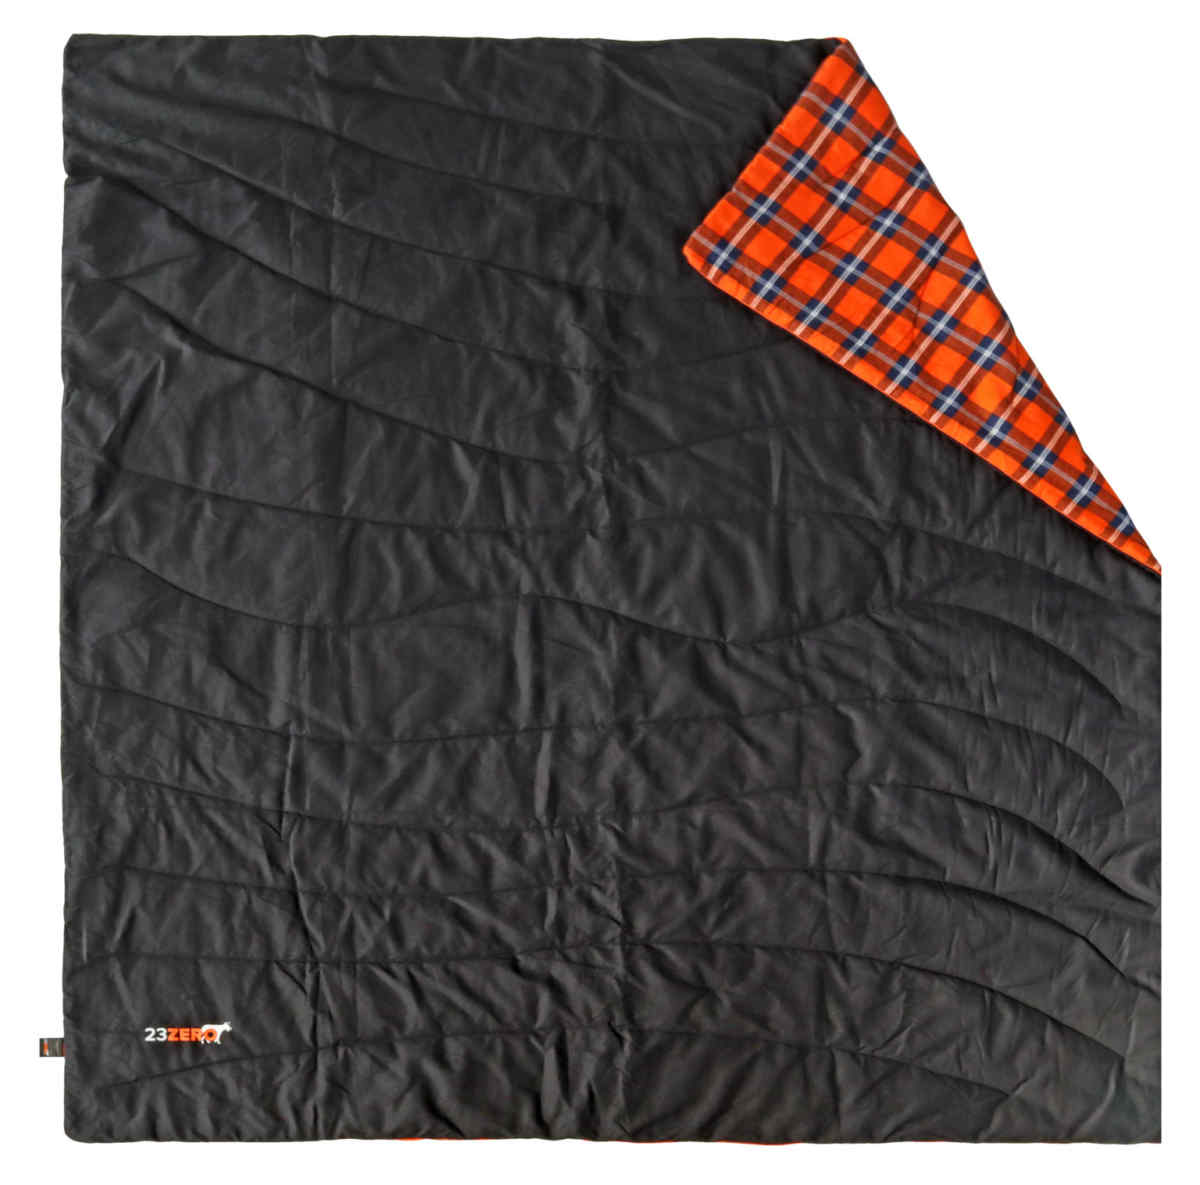 Blankets2-0730-1536×1517